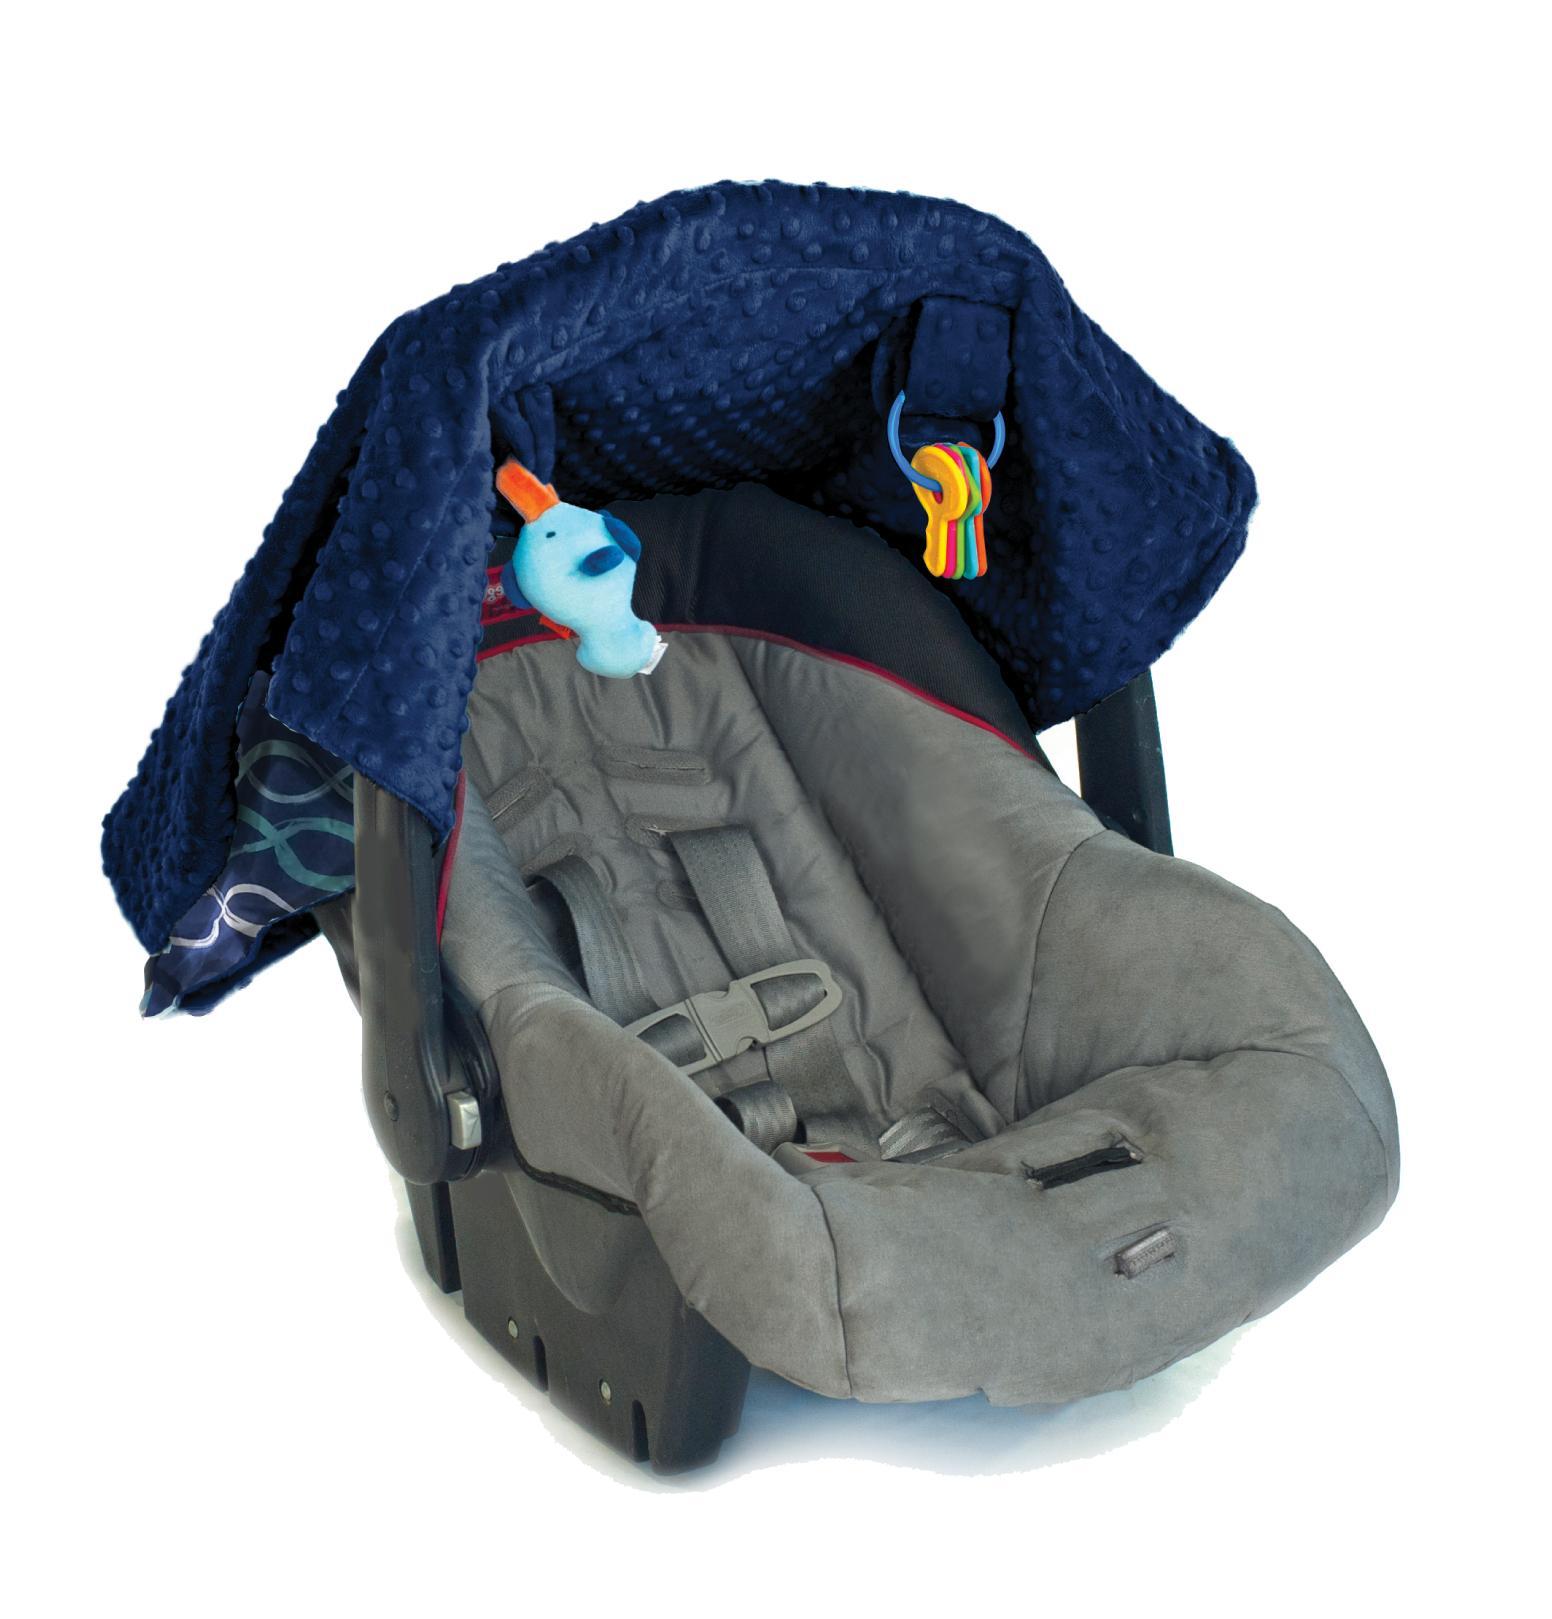 Amazon Com Itzy Ritzy Cozy Happens Infant Car Seat Canopy